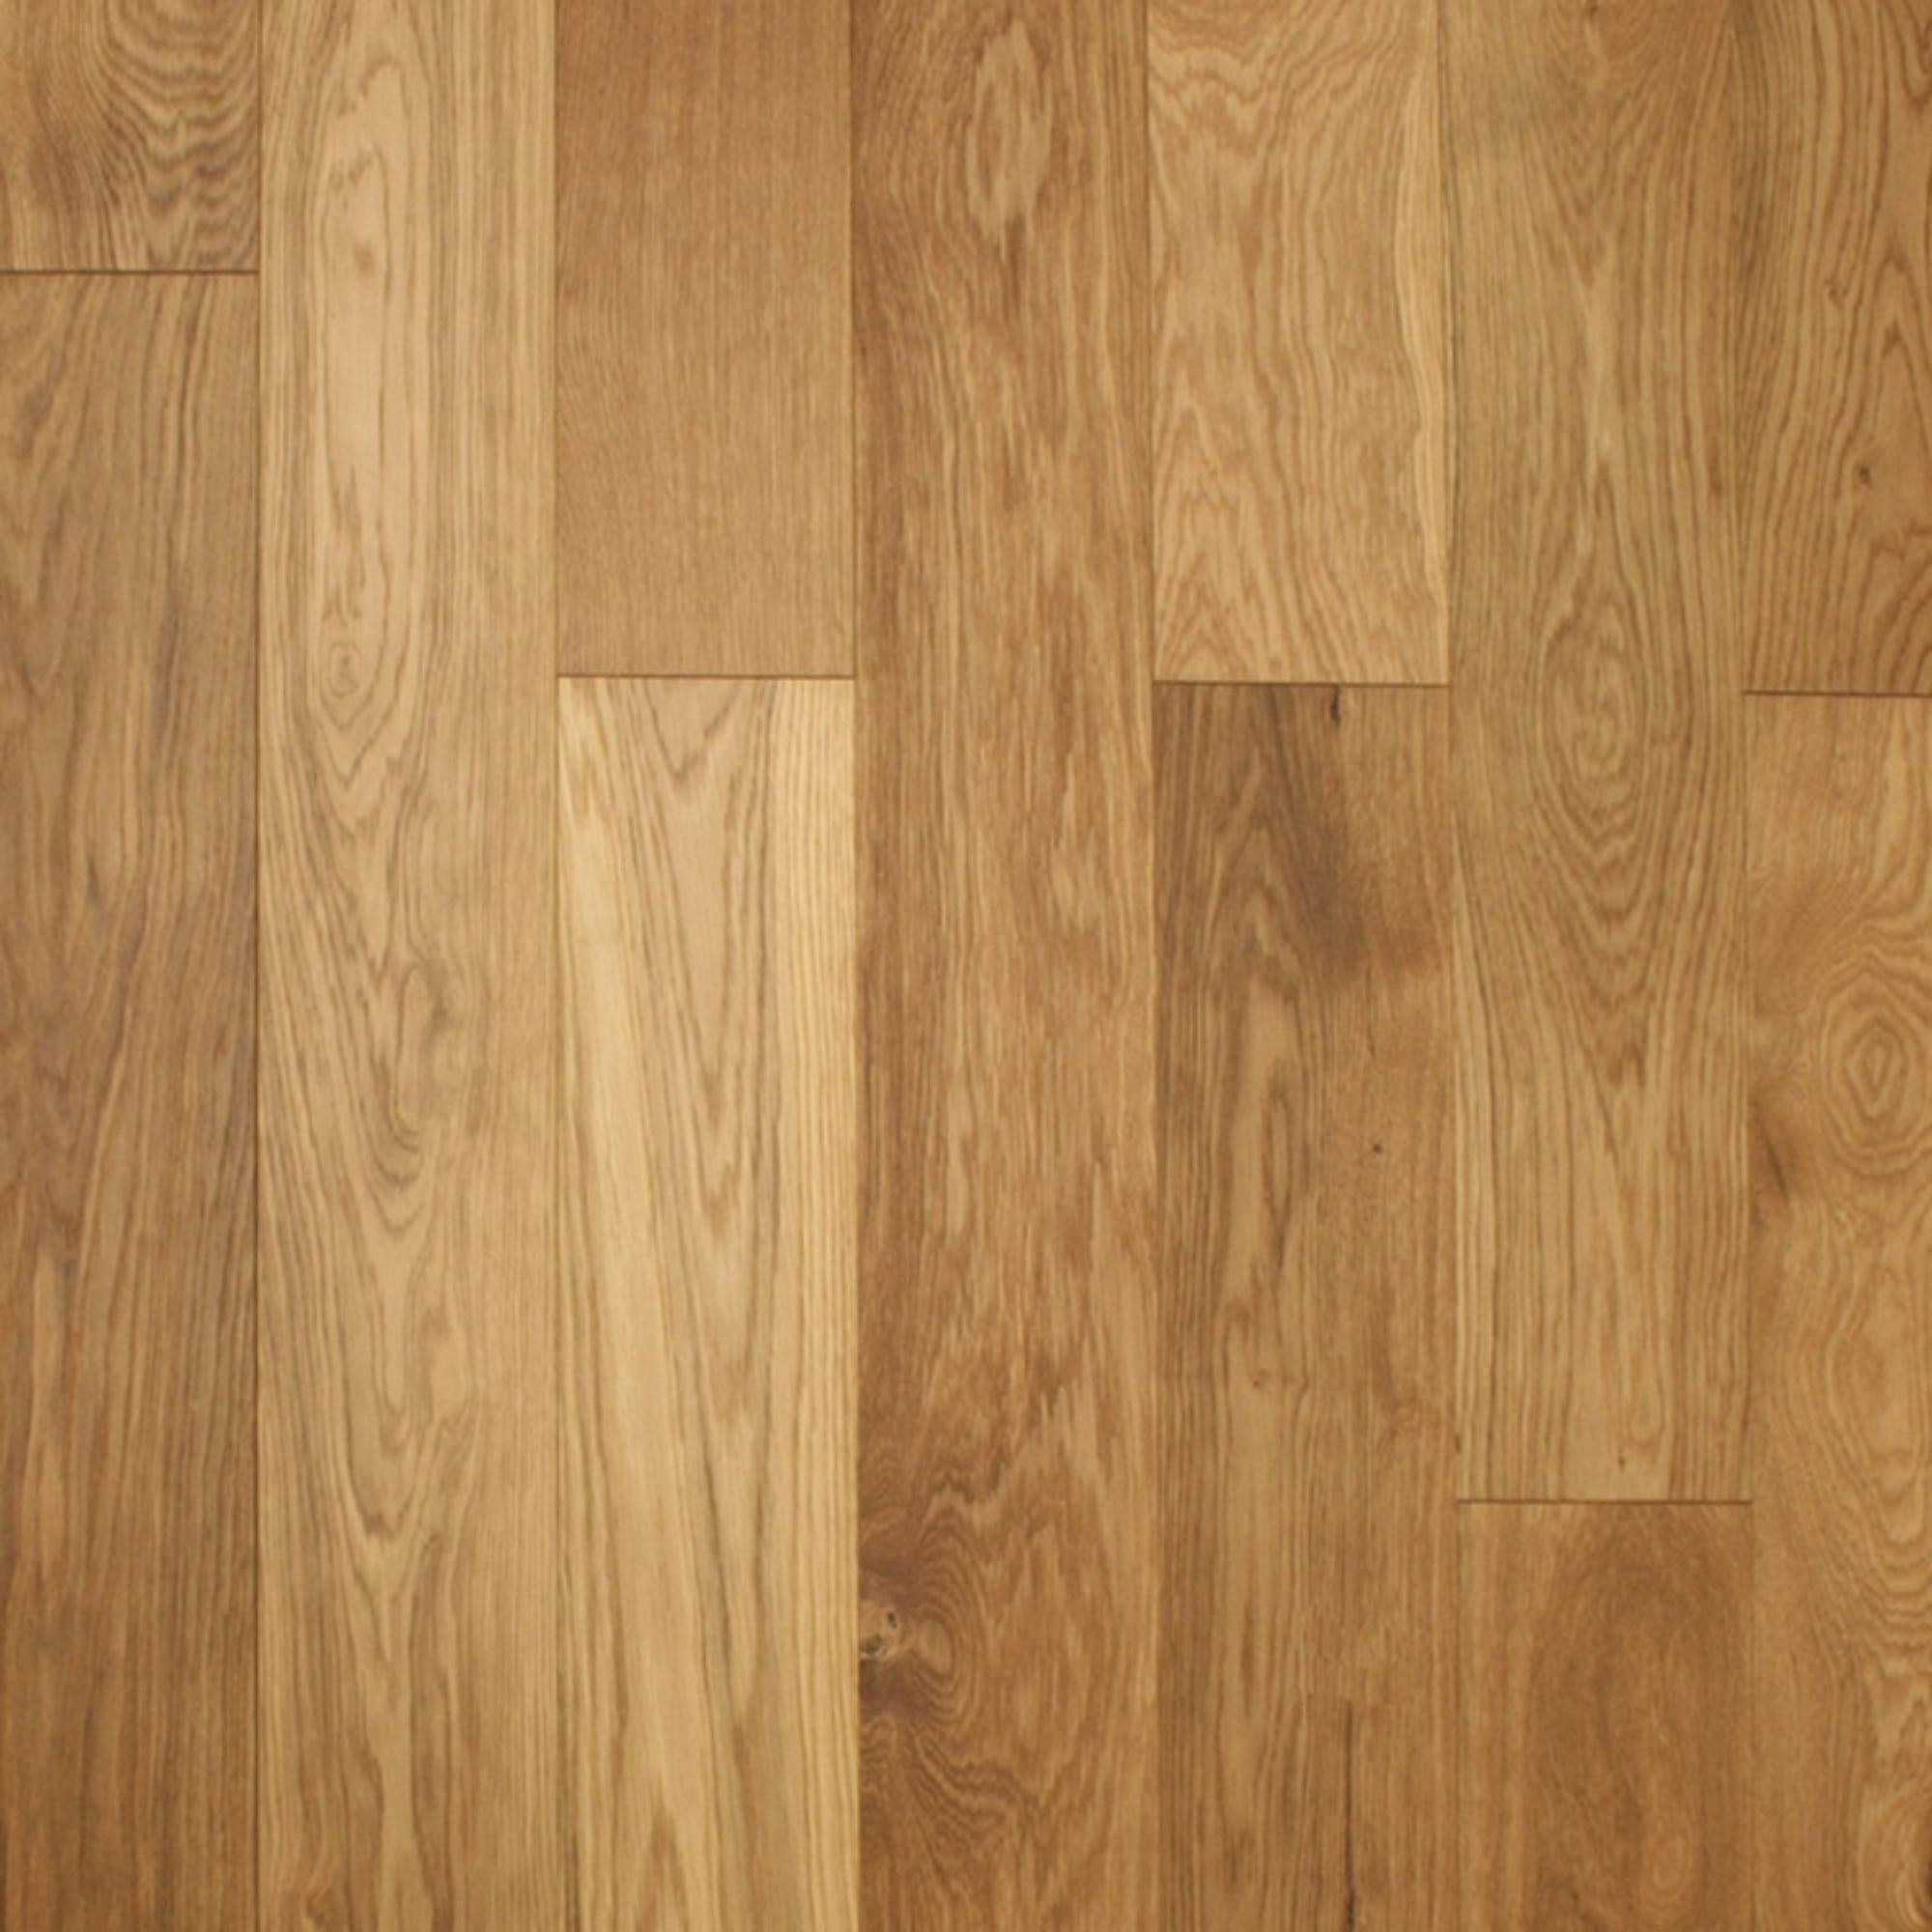 Wood Flooring Multi Layer 18x150mm Brushed Matt